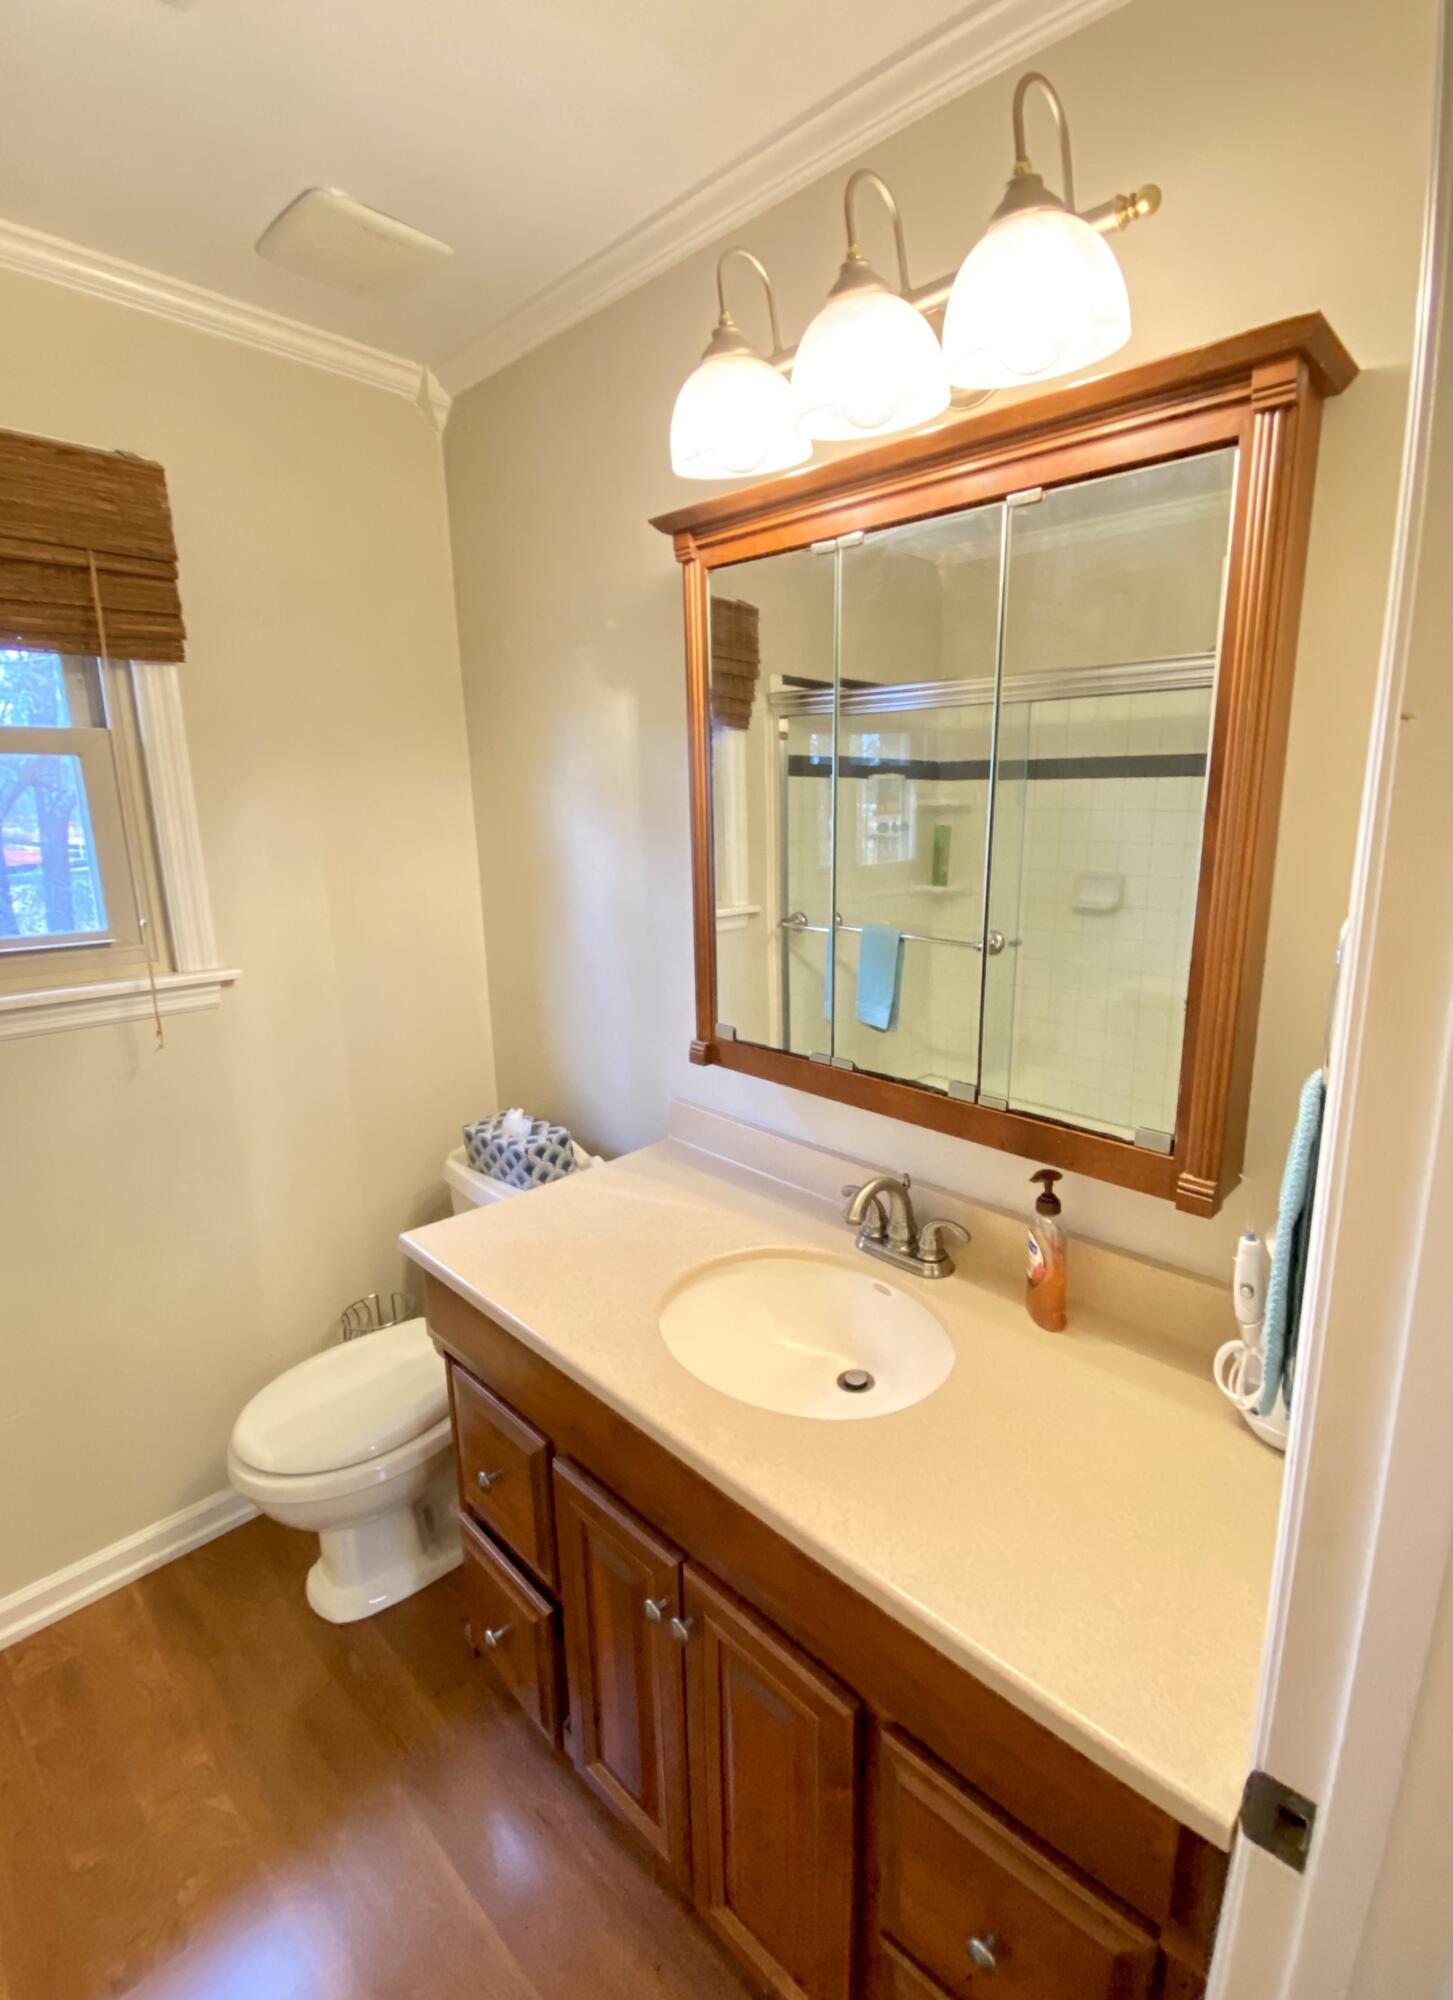 Palmetto Fort Homes For Sale - 1510 Lakeshore, Mount Pleasant, SC - 5